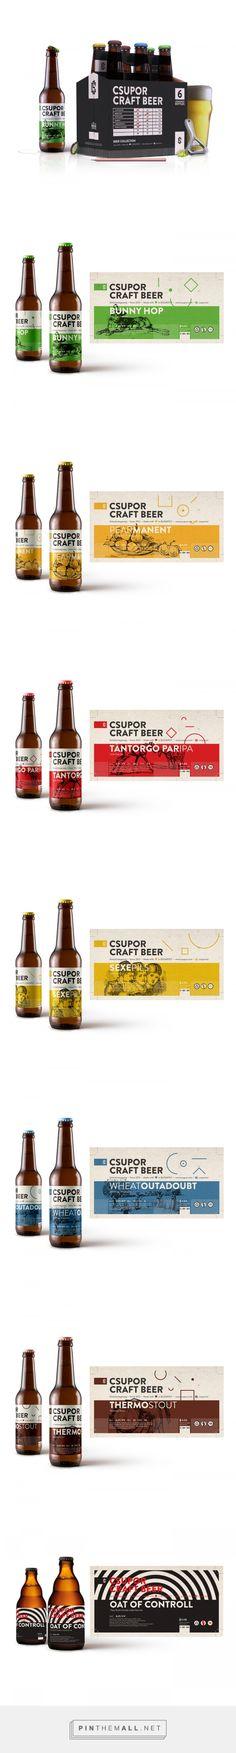 Csupor Craft Beer - Packaging of the World - Creative Package Design Gallery - http://www.packagingoftheworld.com/2017/08/csupor-craft-beer.html